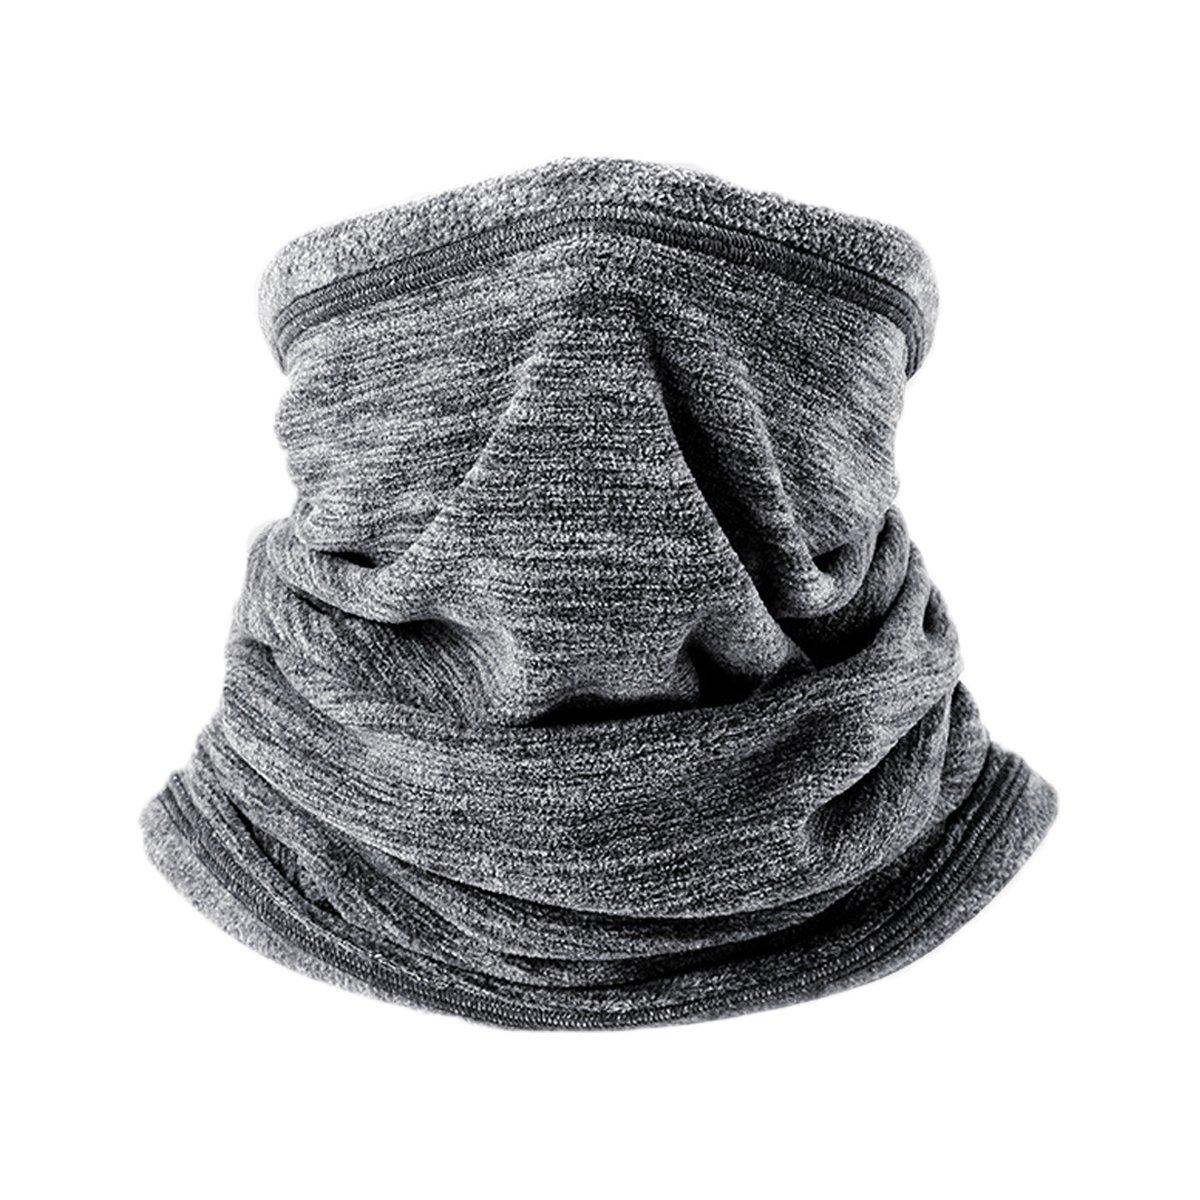 Beechfield Morf ALL STYLES Multi Use OFFICIAL Head Neck Wear Snood Scarf Warmer